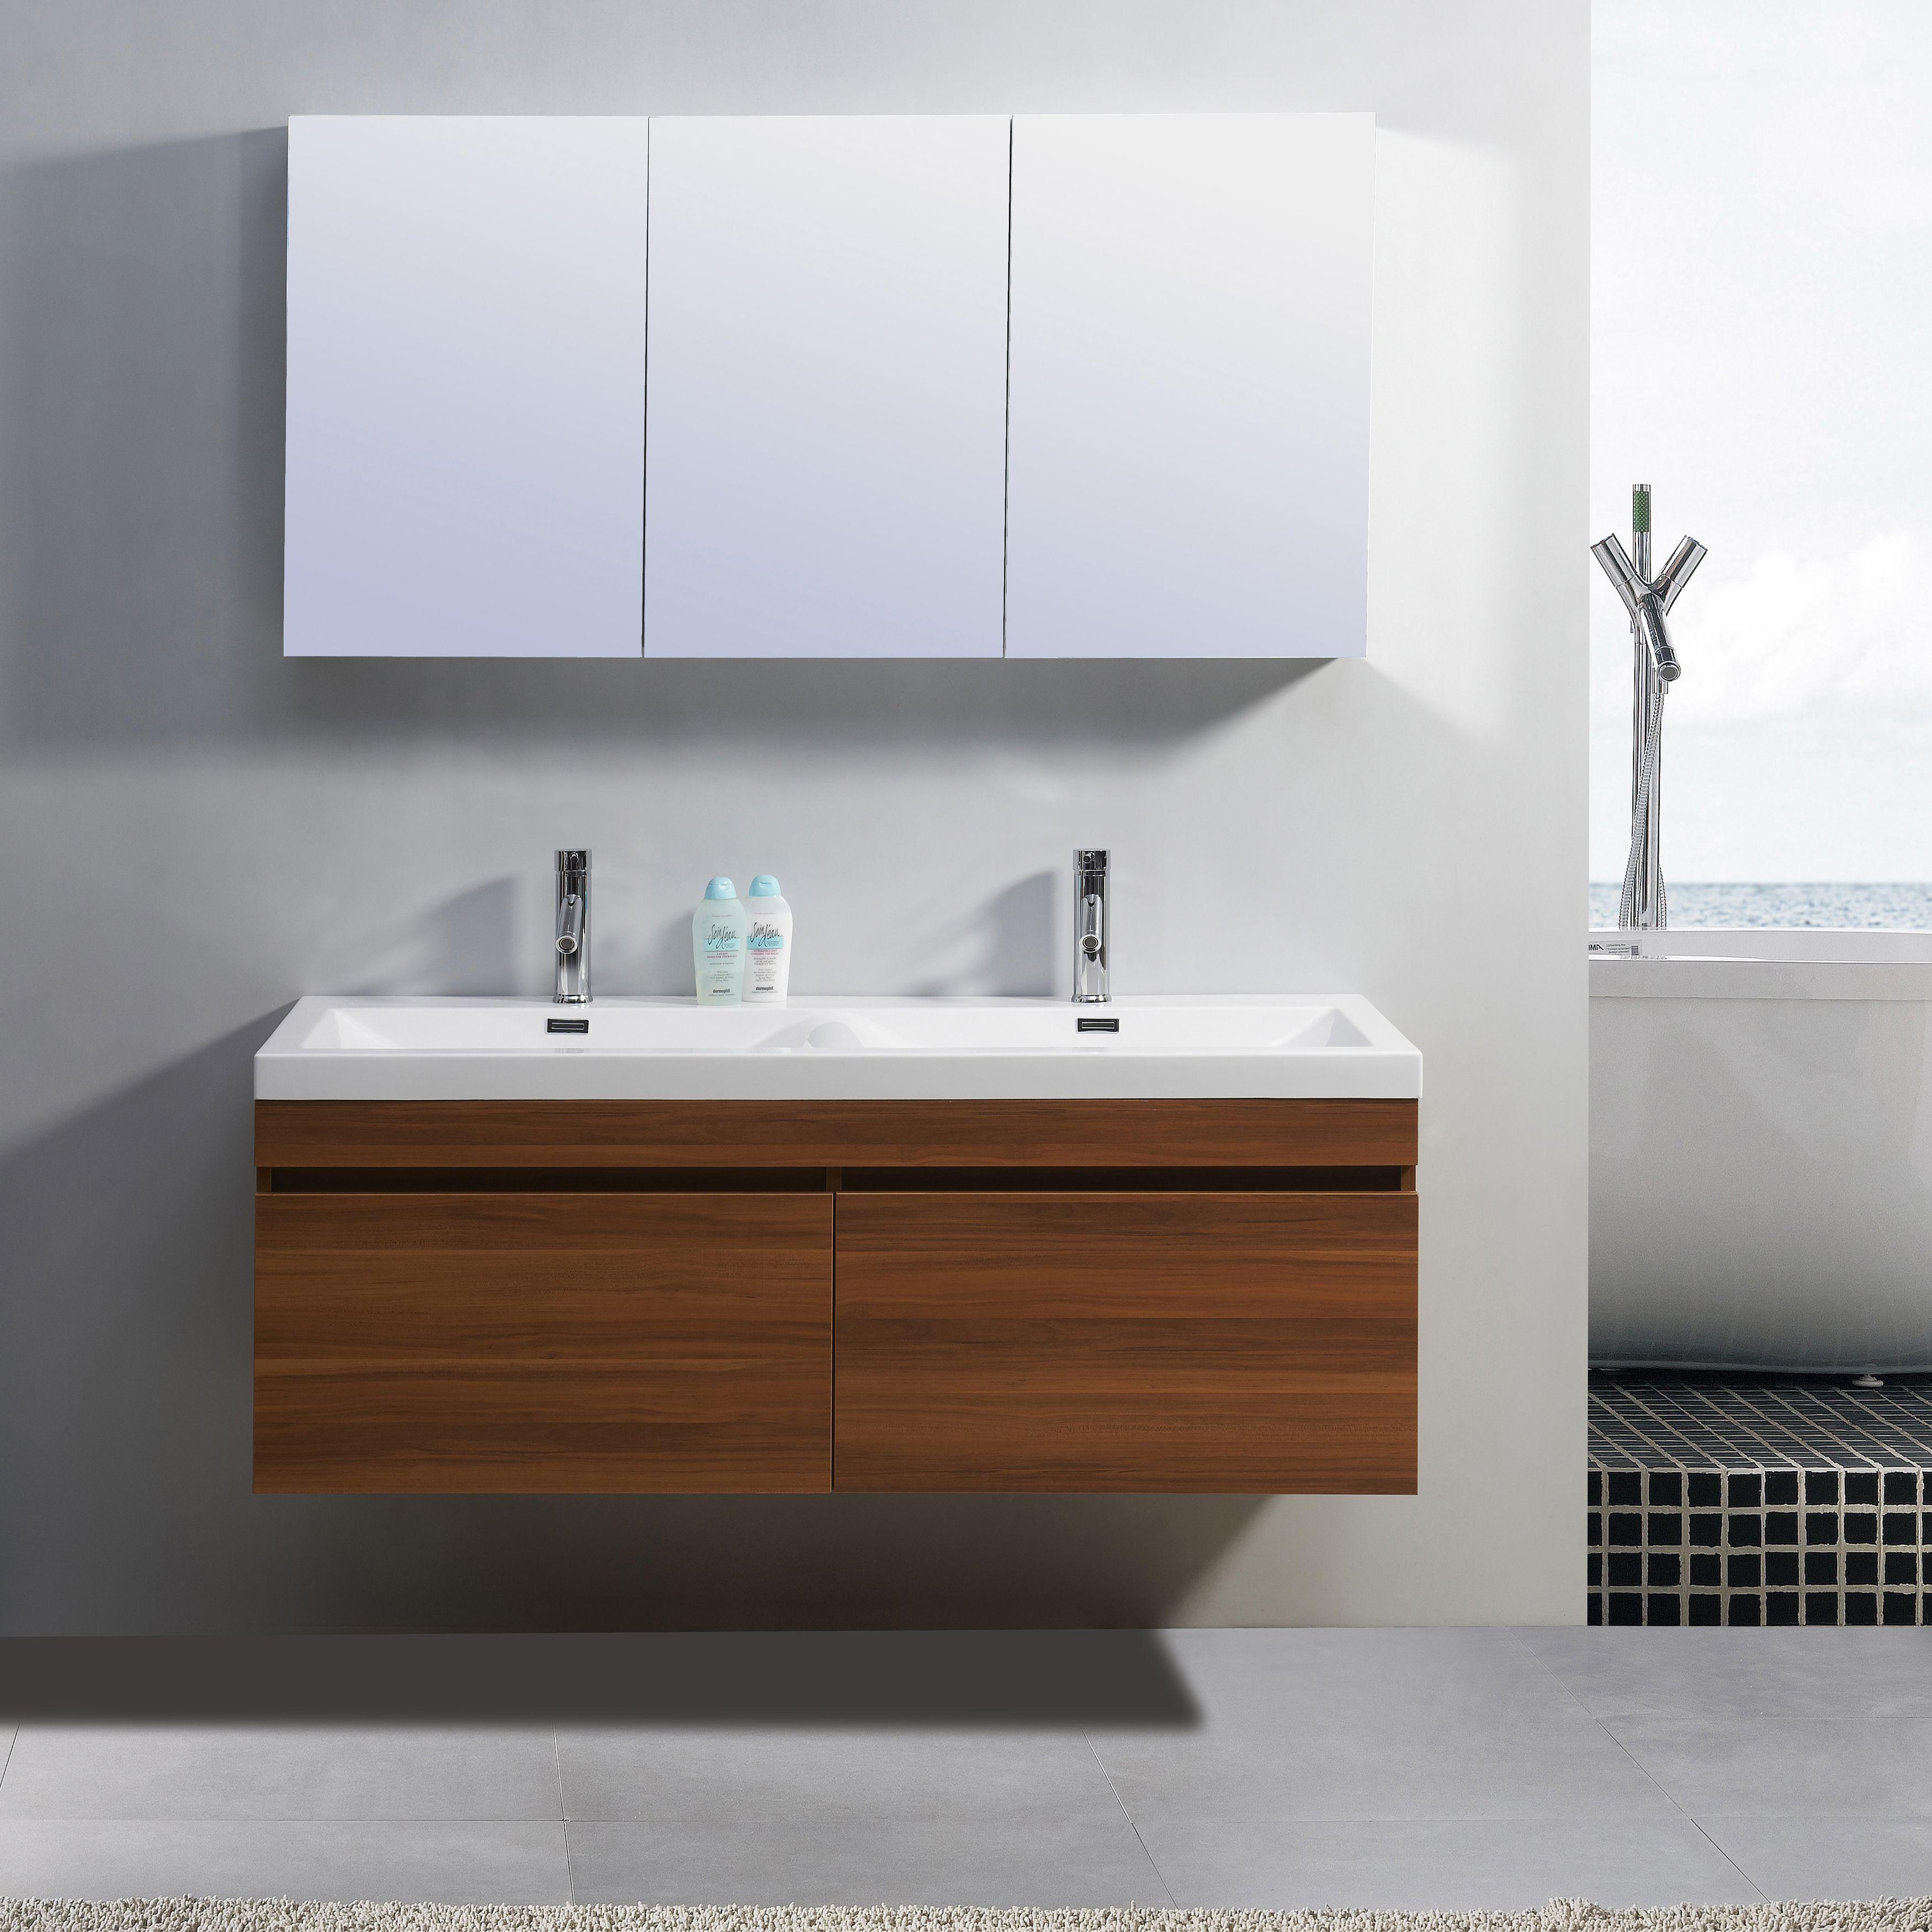 Virtu USA Zuri Inch Double Sink Vanity By VIRTU USA - 55 inch double sink bathroom vanity for bathroom decor ideas